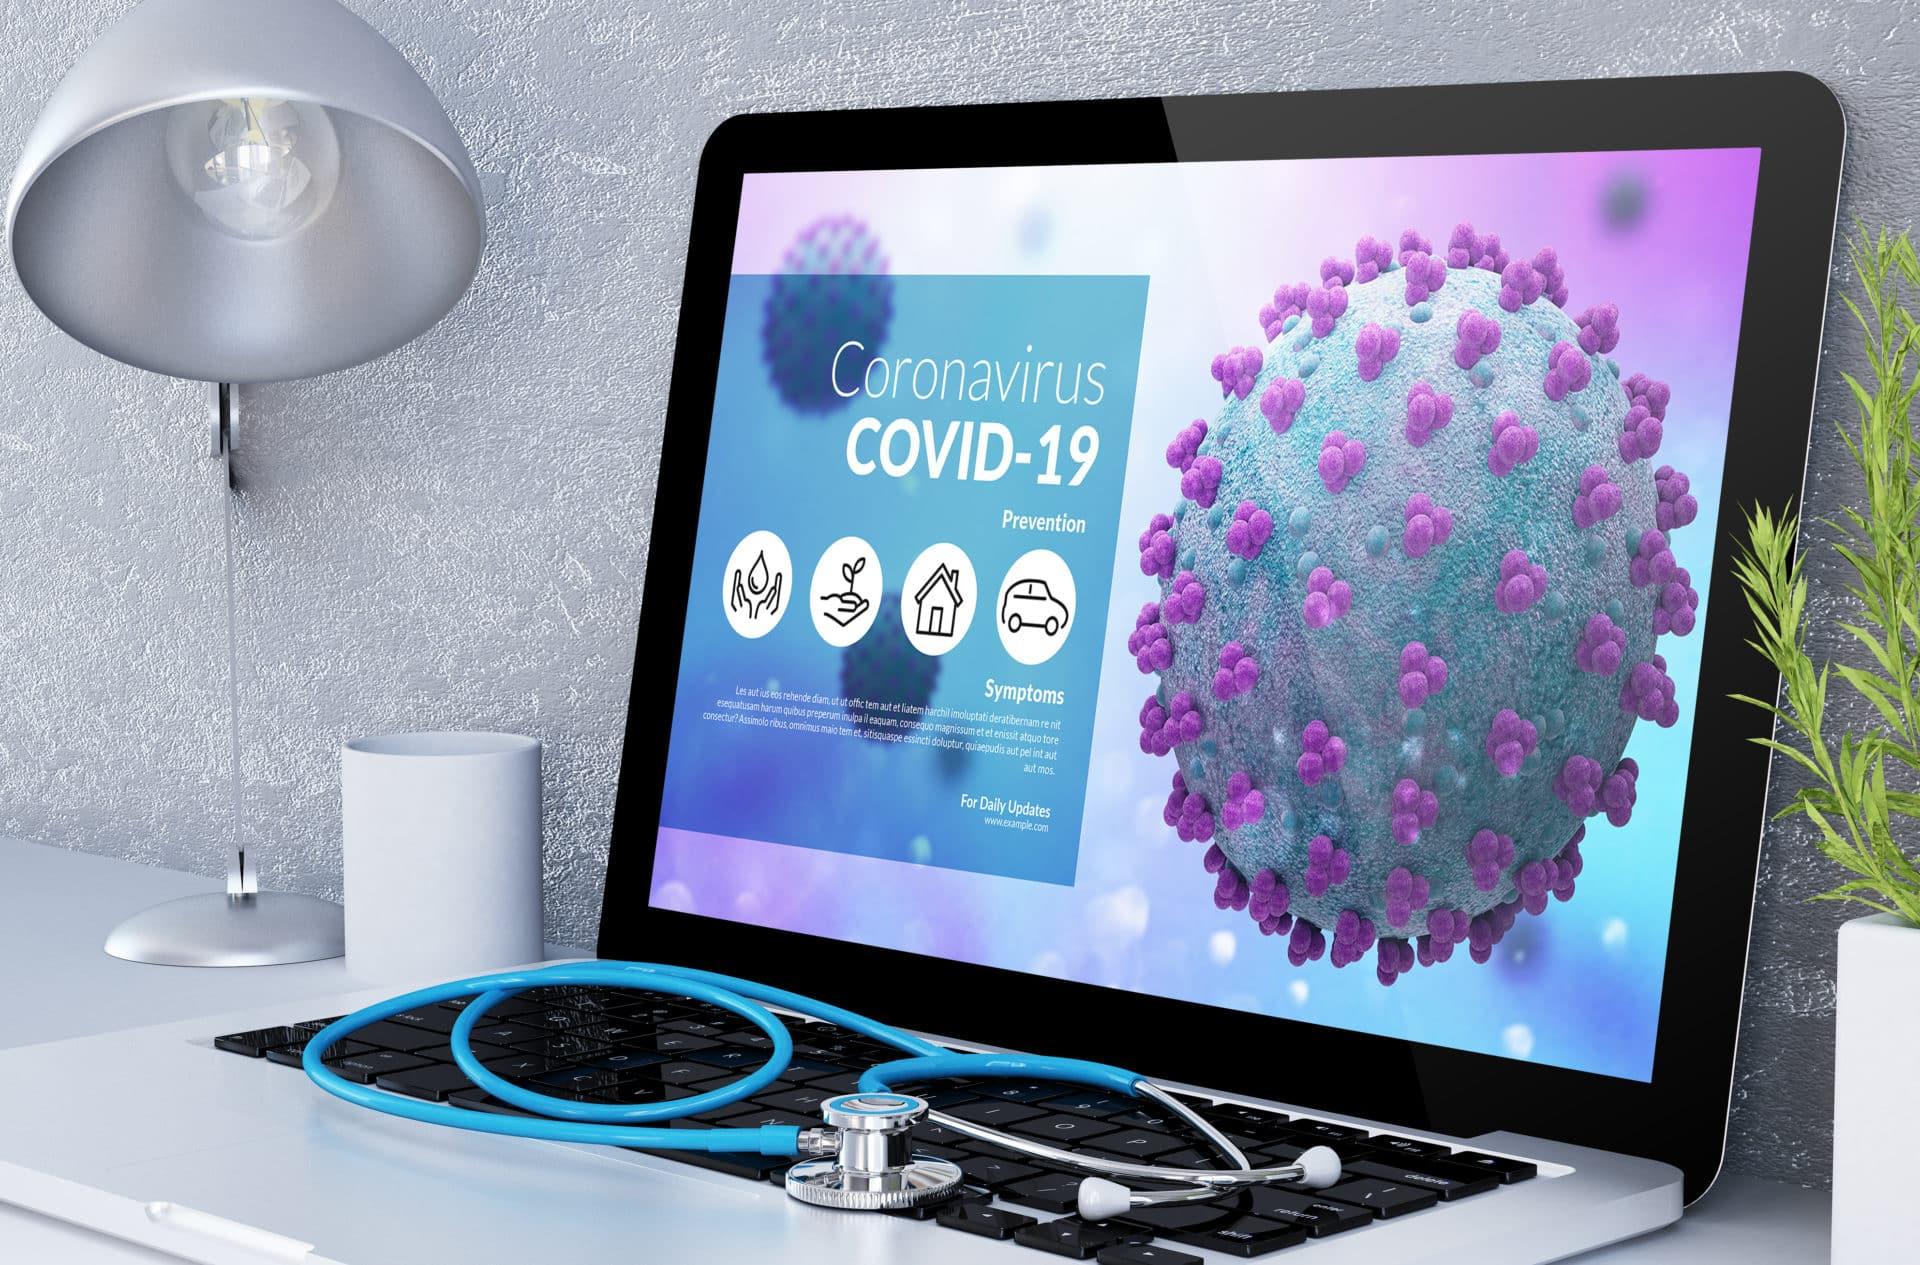 covid-19 info website